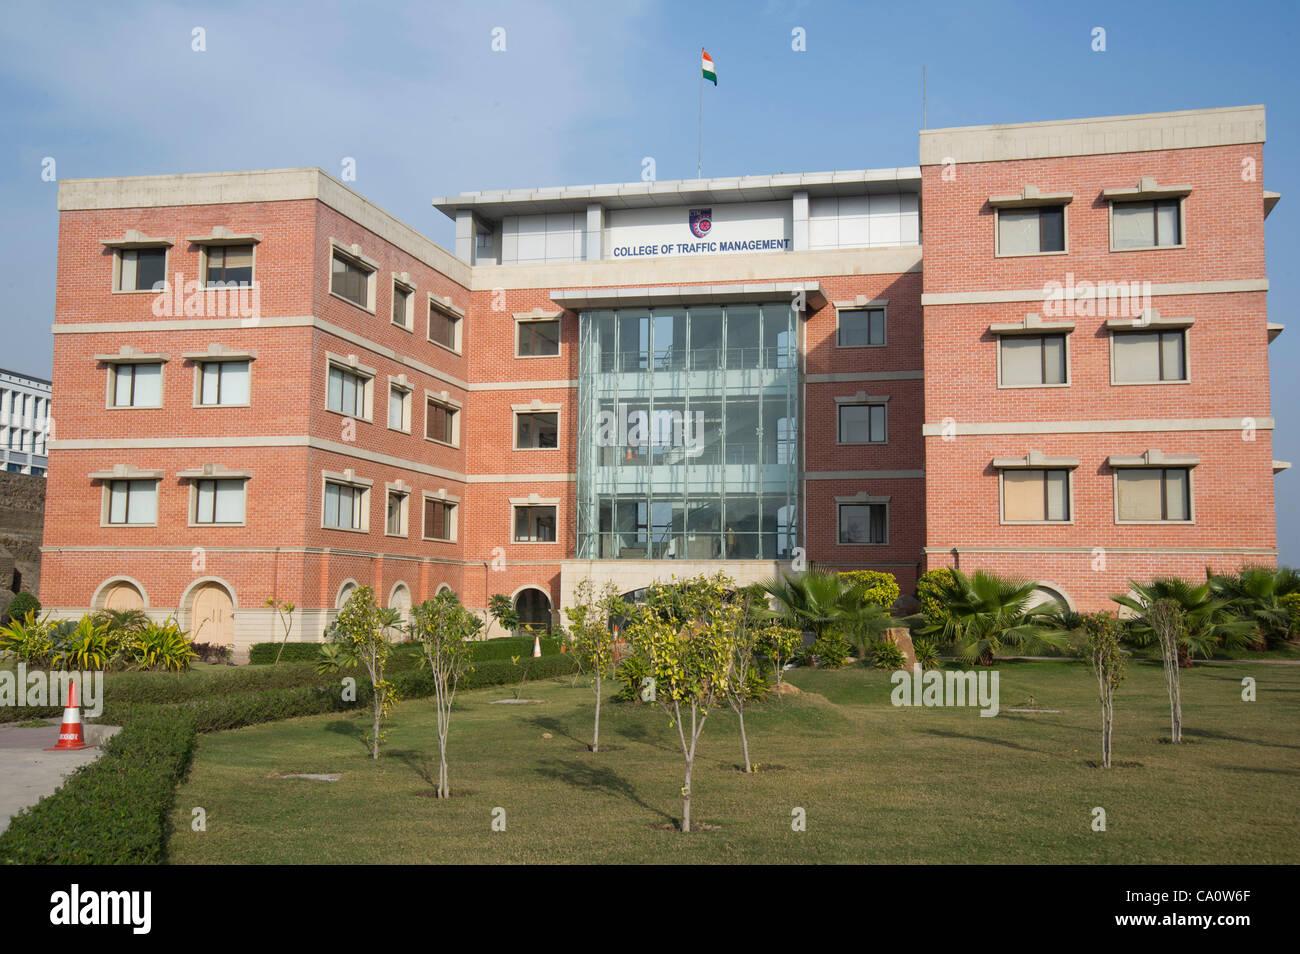 Haryana State Stock Photos & Haryana State Stock Images - Alamy